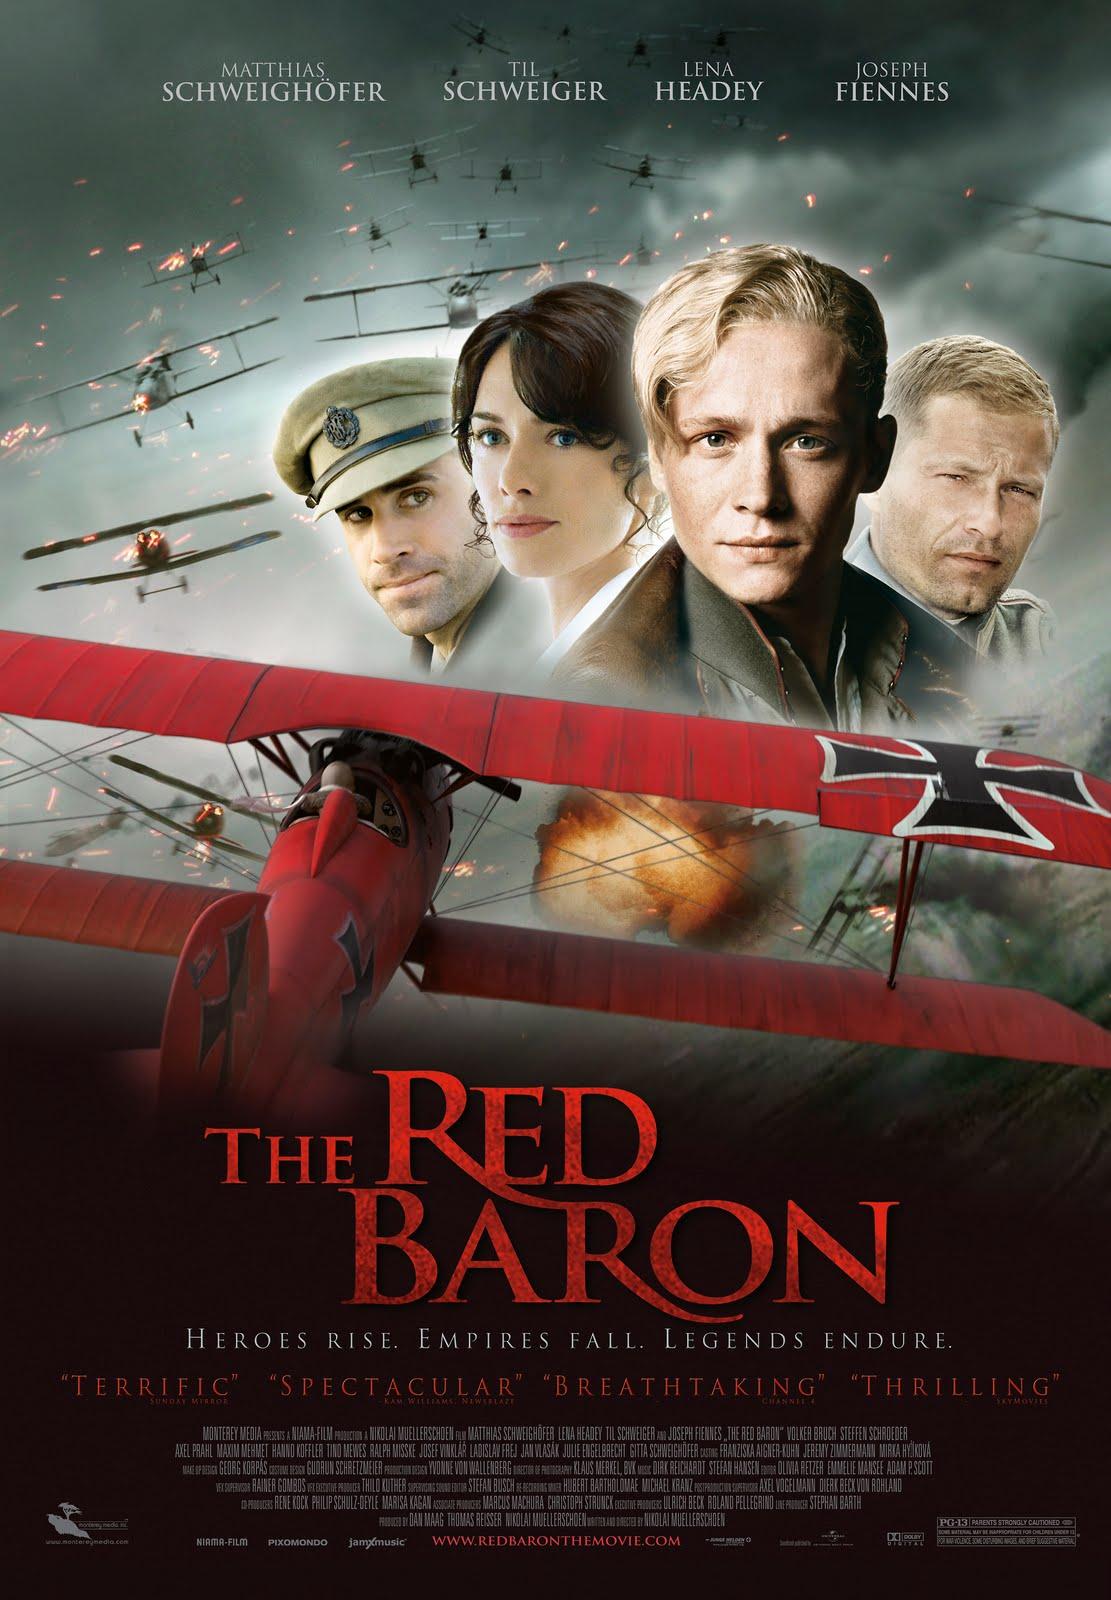 http://2.bp.blogspot.com/_VNgVmL1JCkU/TD7wC9NCrnI/AAAAAAAAD44/6LIRUZ2AC-g/s1600/Red+Baron+Movie+Poster.jpg